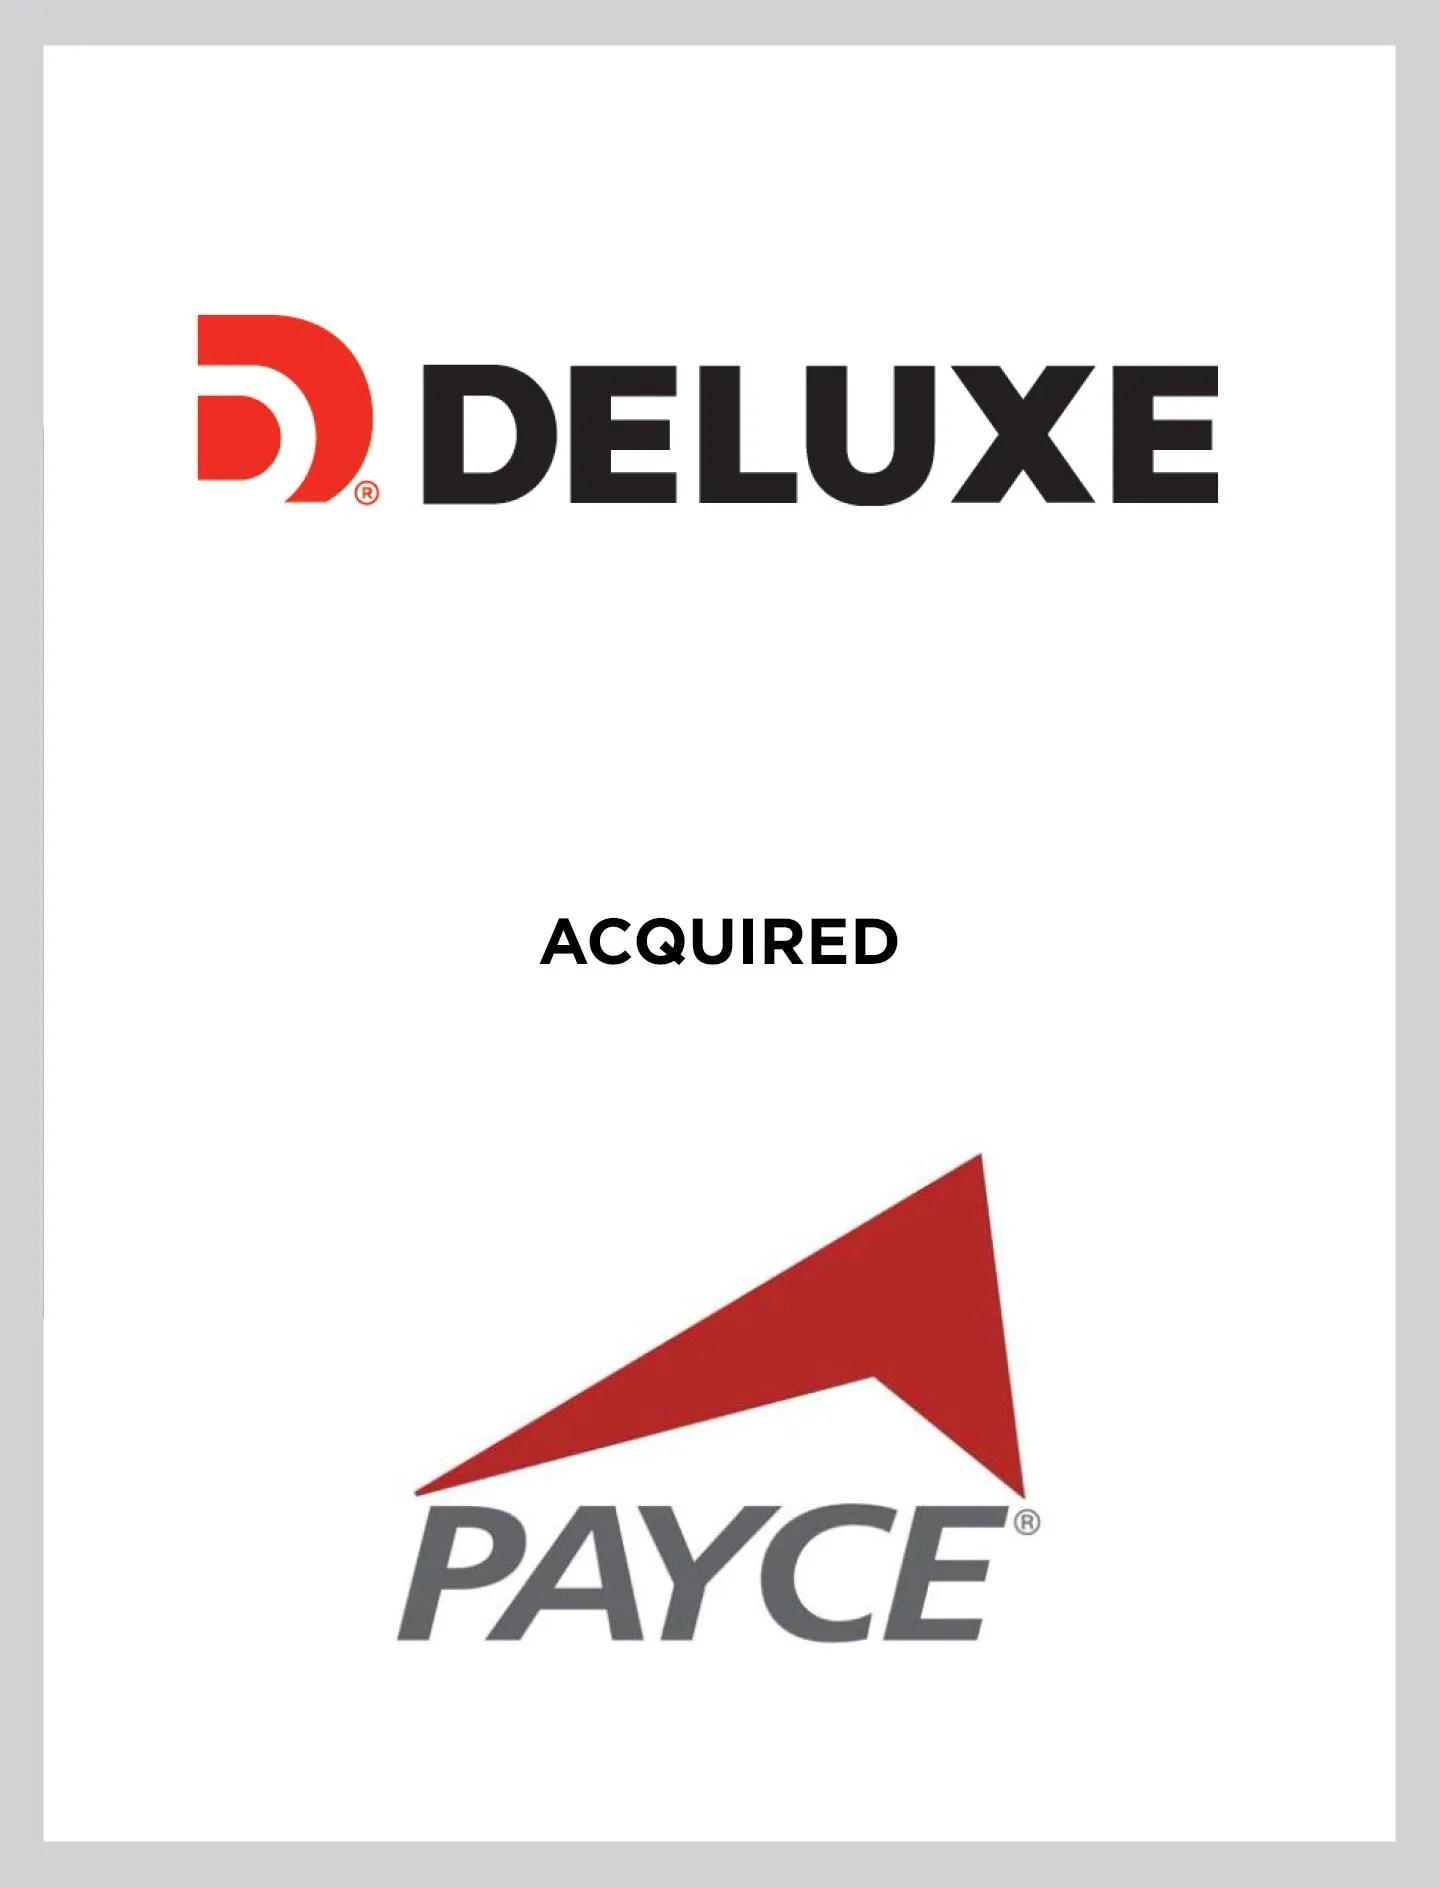 Deluxe/Payce Case Study